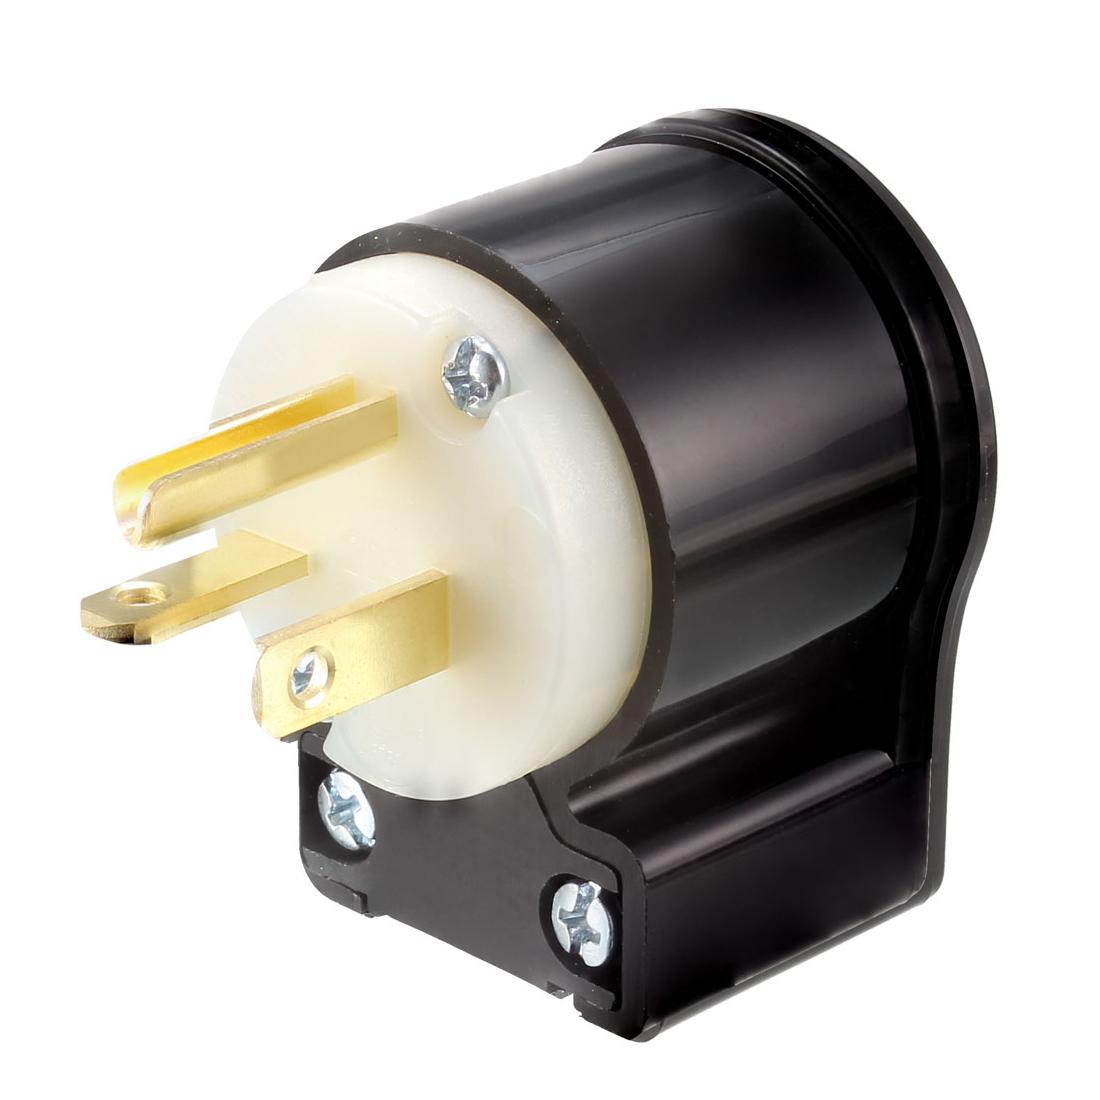 Locking Plug Male NEMA 5-20P 20A 125VAC 2 Pole 3 Wire Grounding Industrial Grade